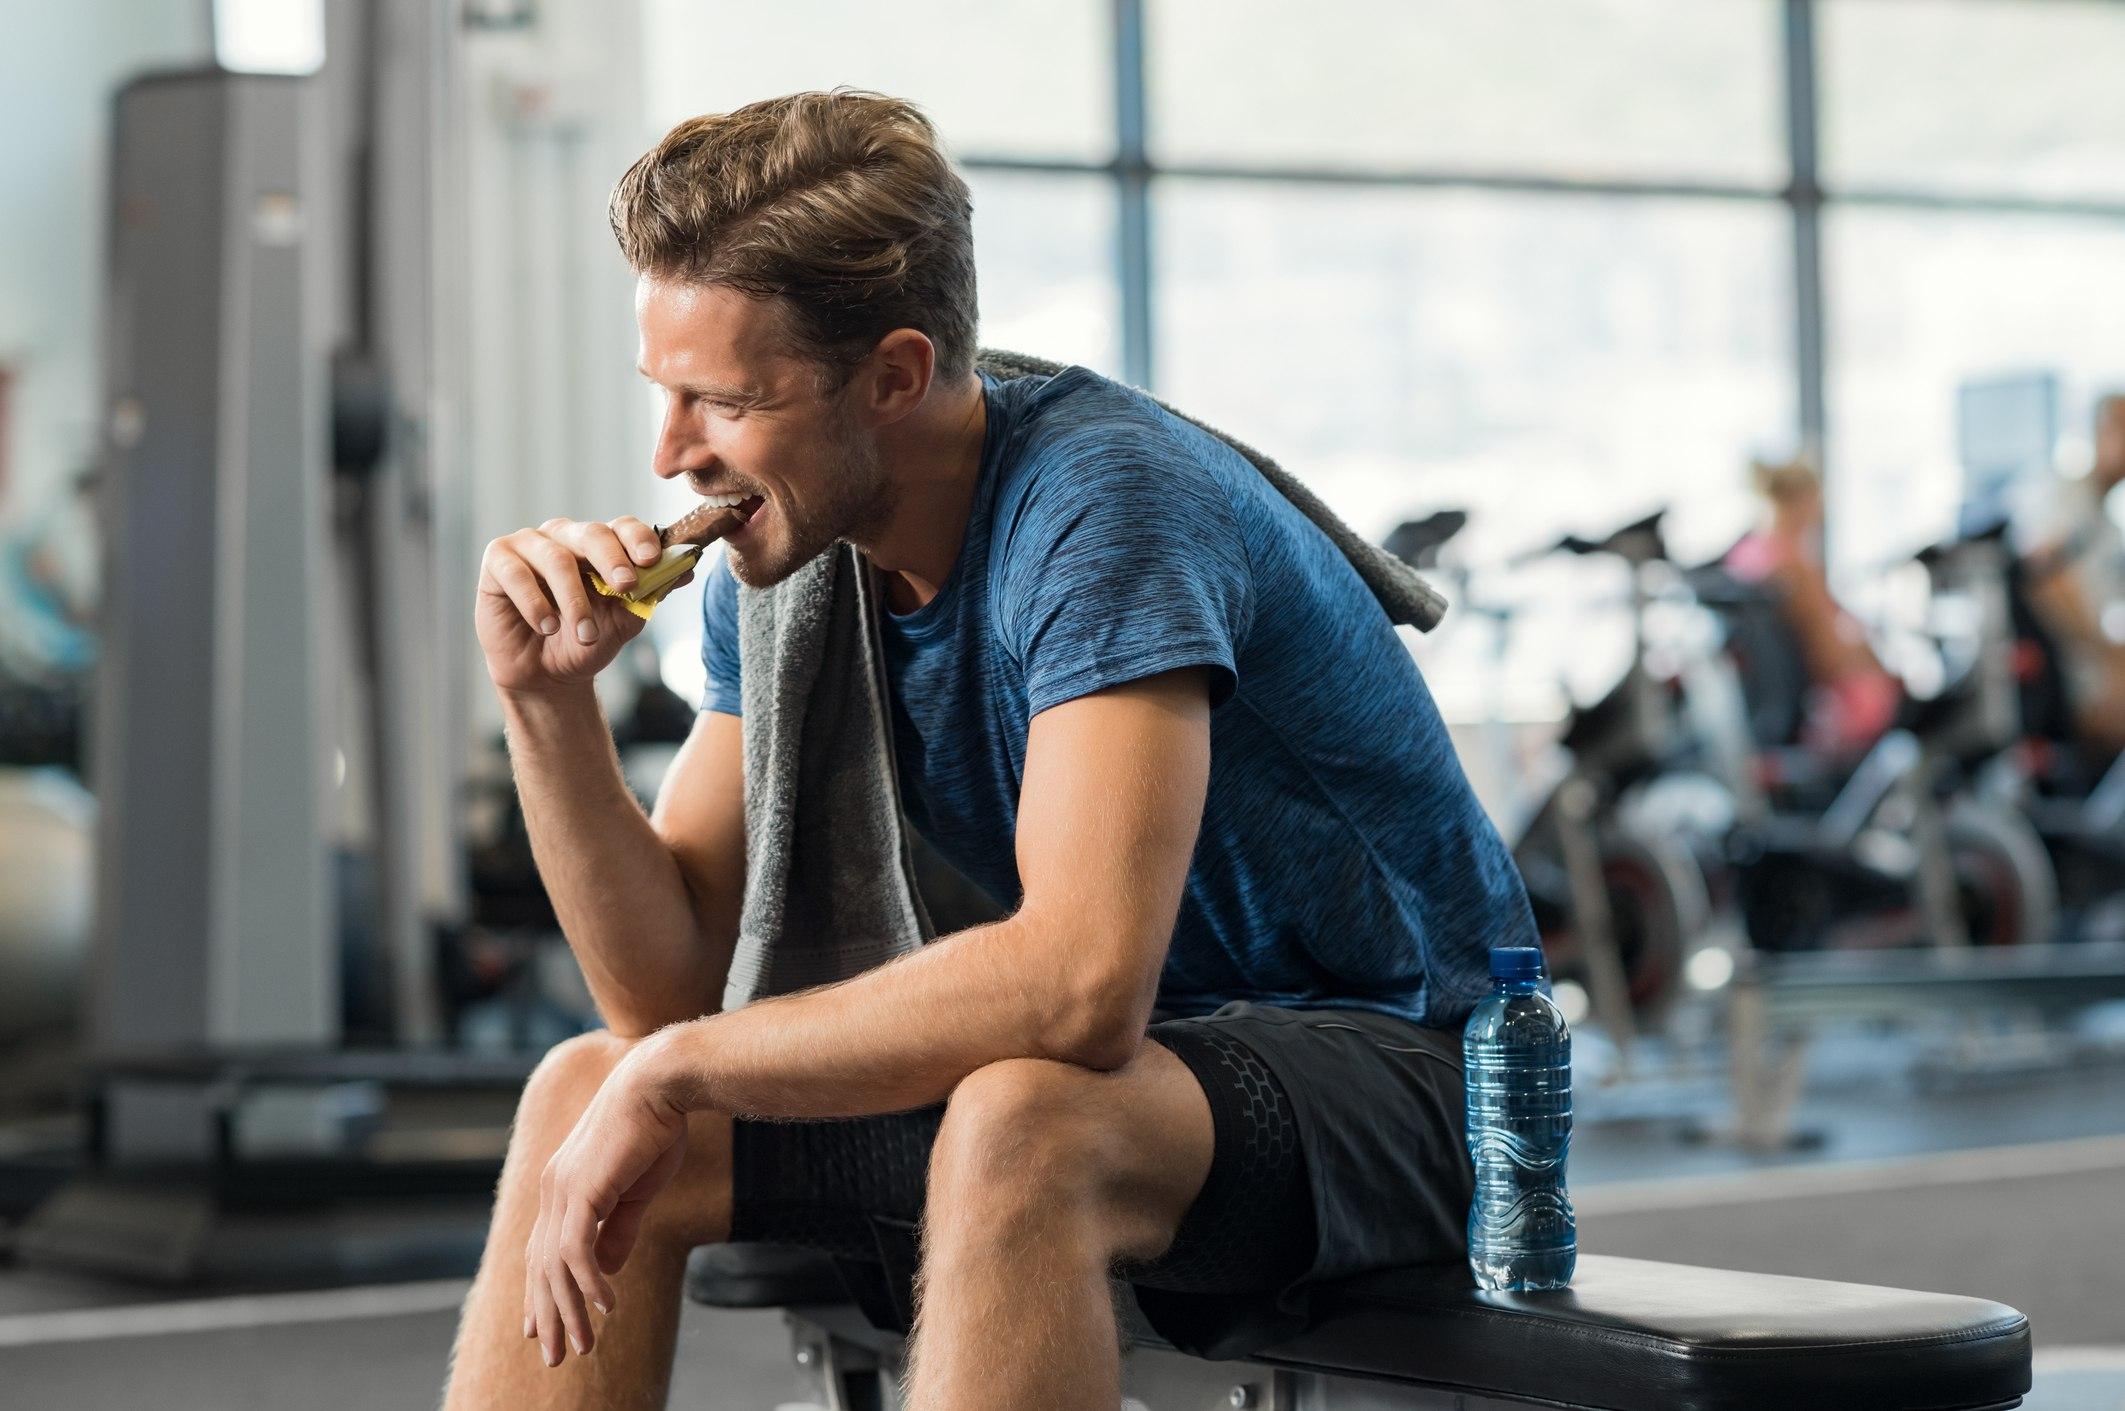 Sweaty young man eating energy bar at gym